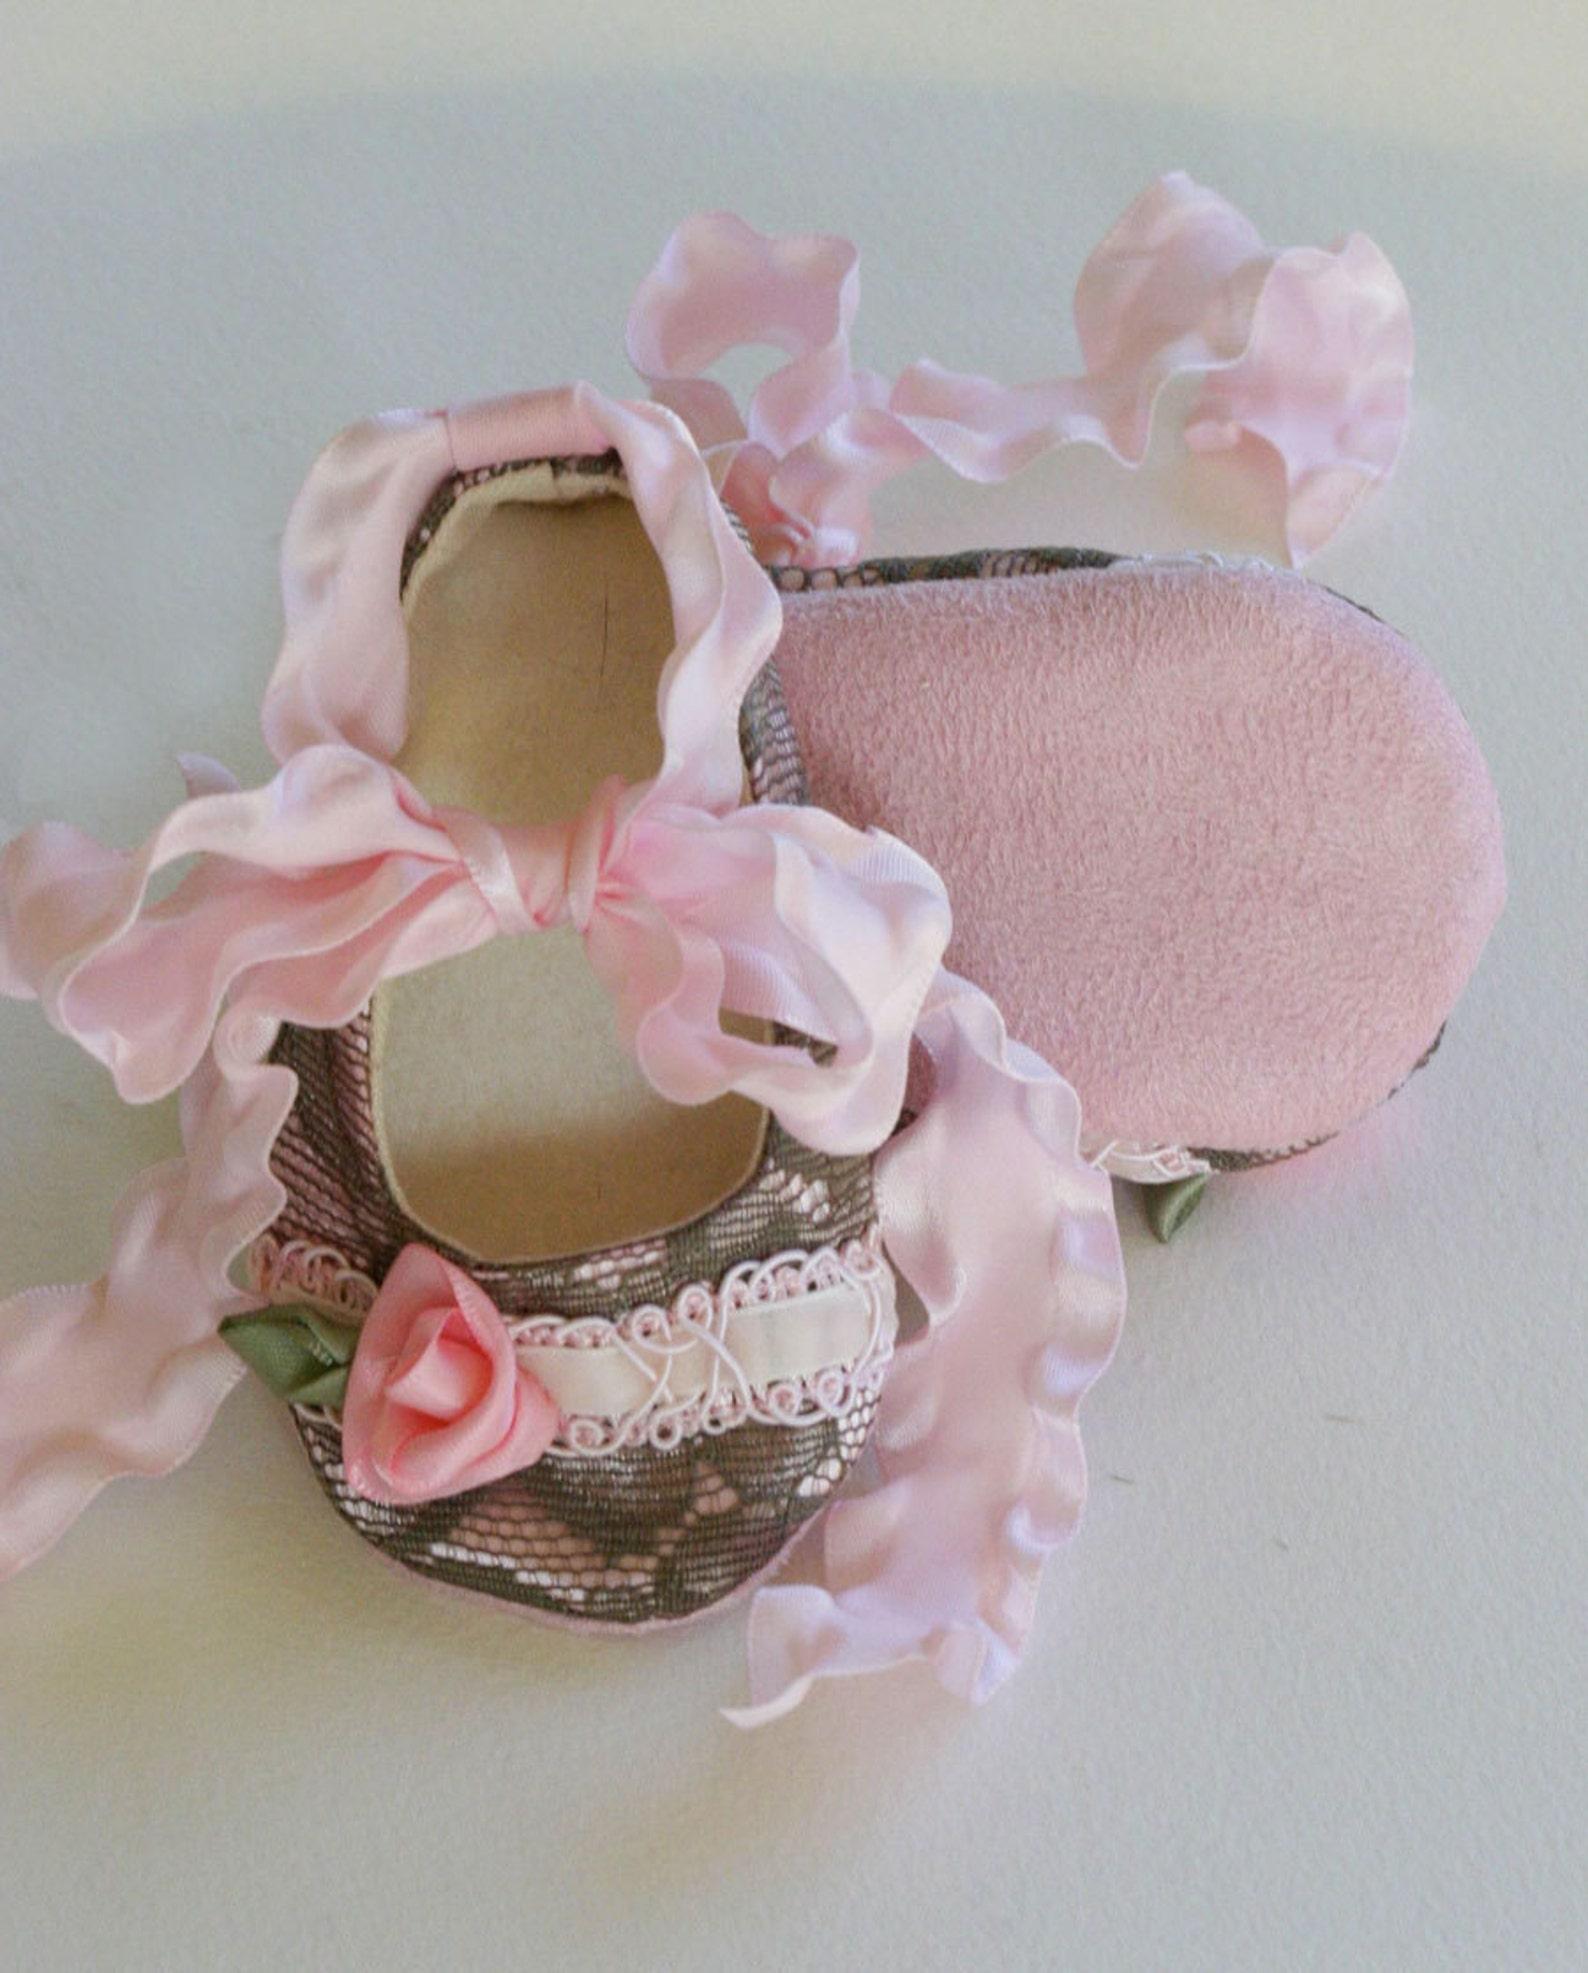 lace baby bootie, pink baby crib shoe, shower gift toddler ballet flat, baby ballet slipper, flower girl shoe, handmade baby sho